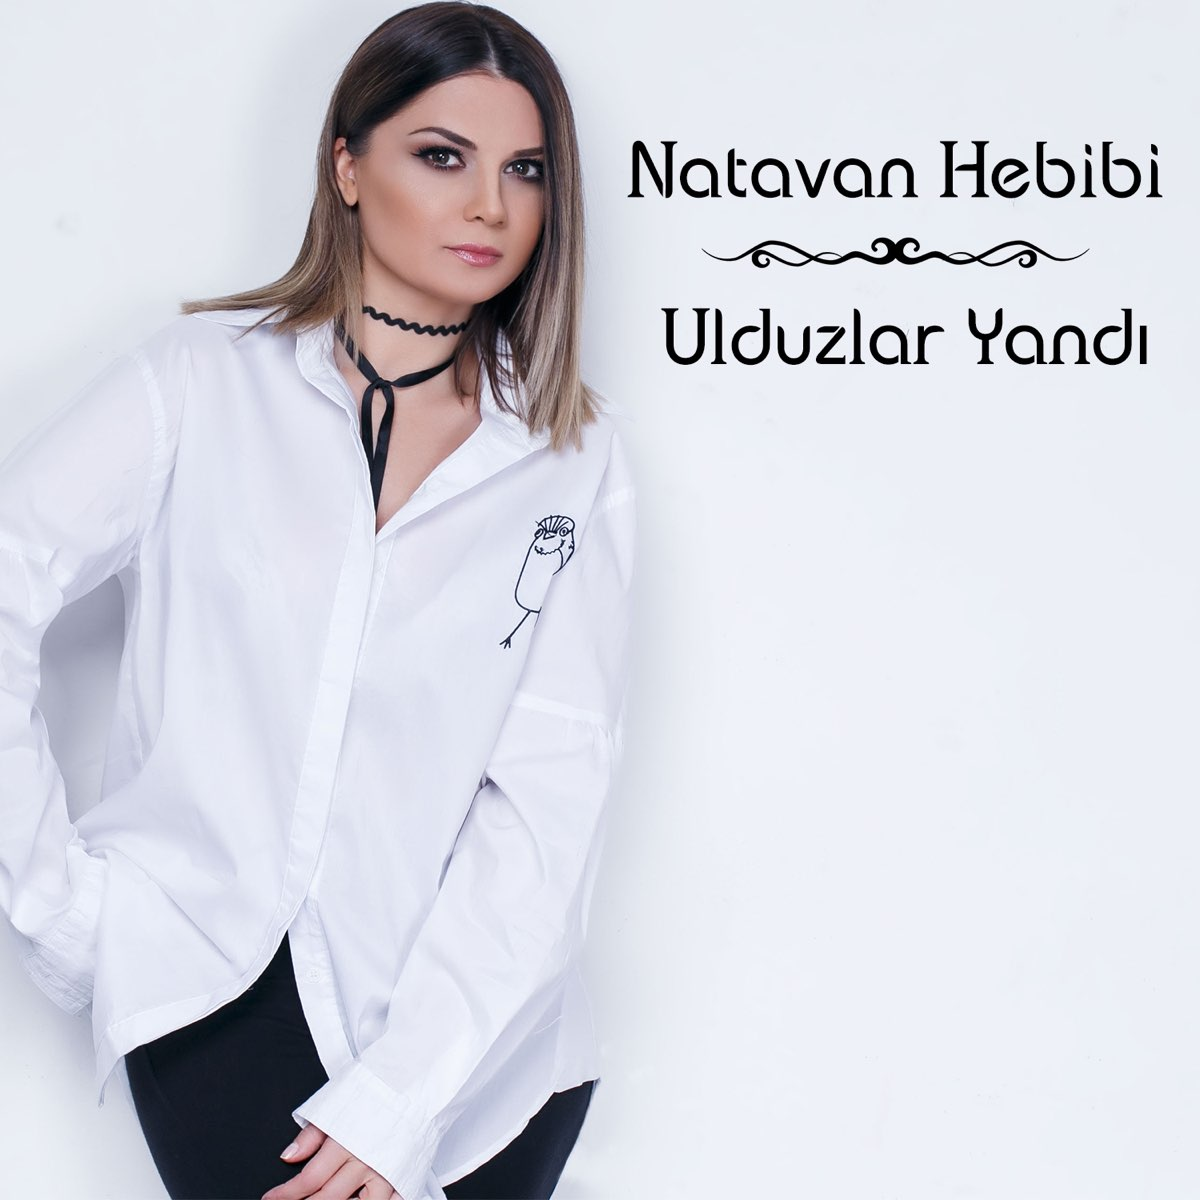 Ulduzlar Yandi Single By Natavan Hebibi On Apple Music